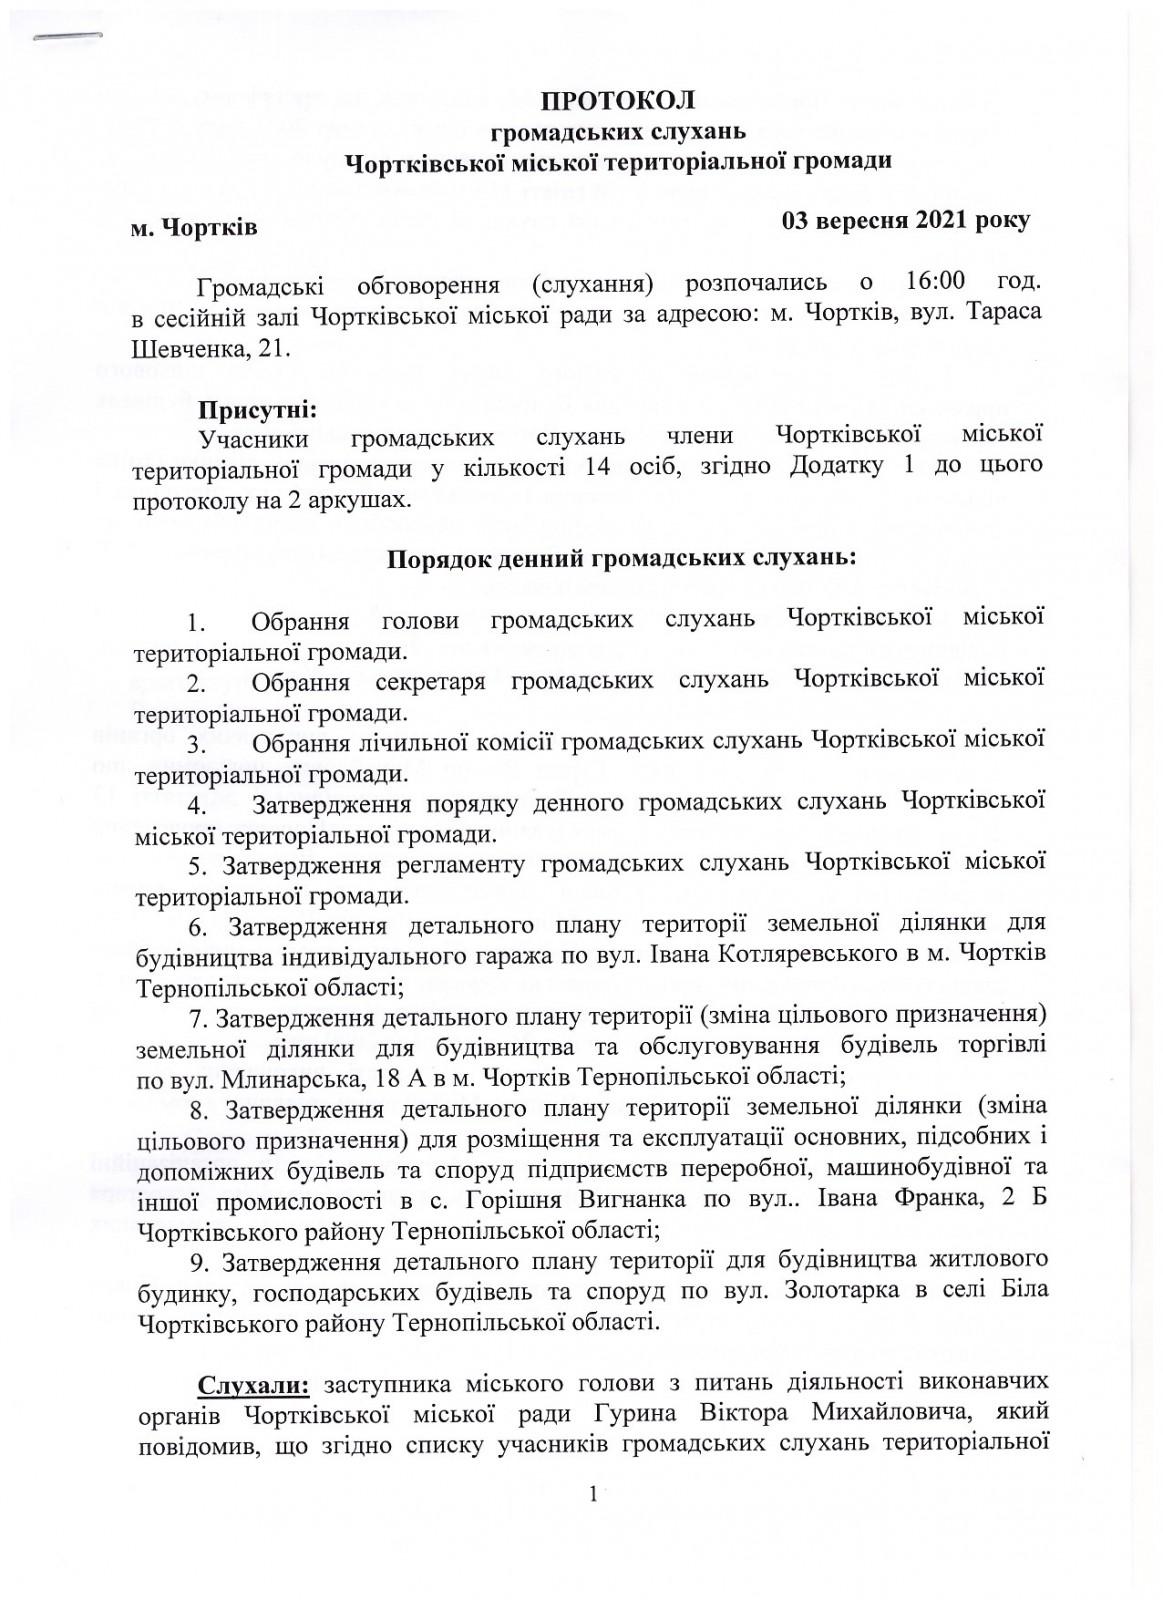 протокол громадських слухань_03-09-2021 (-1